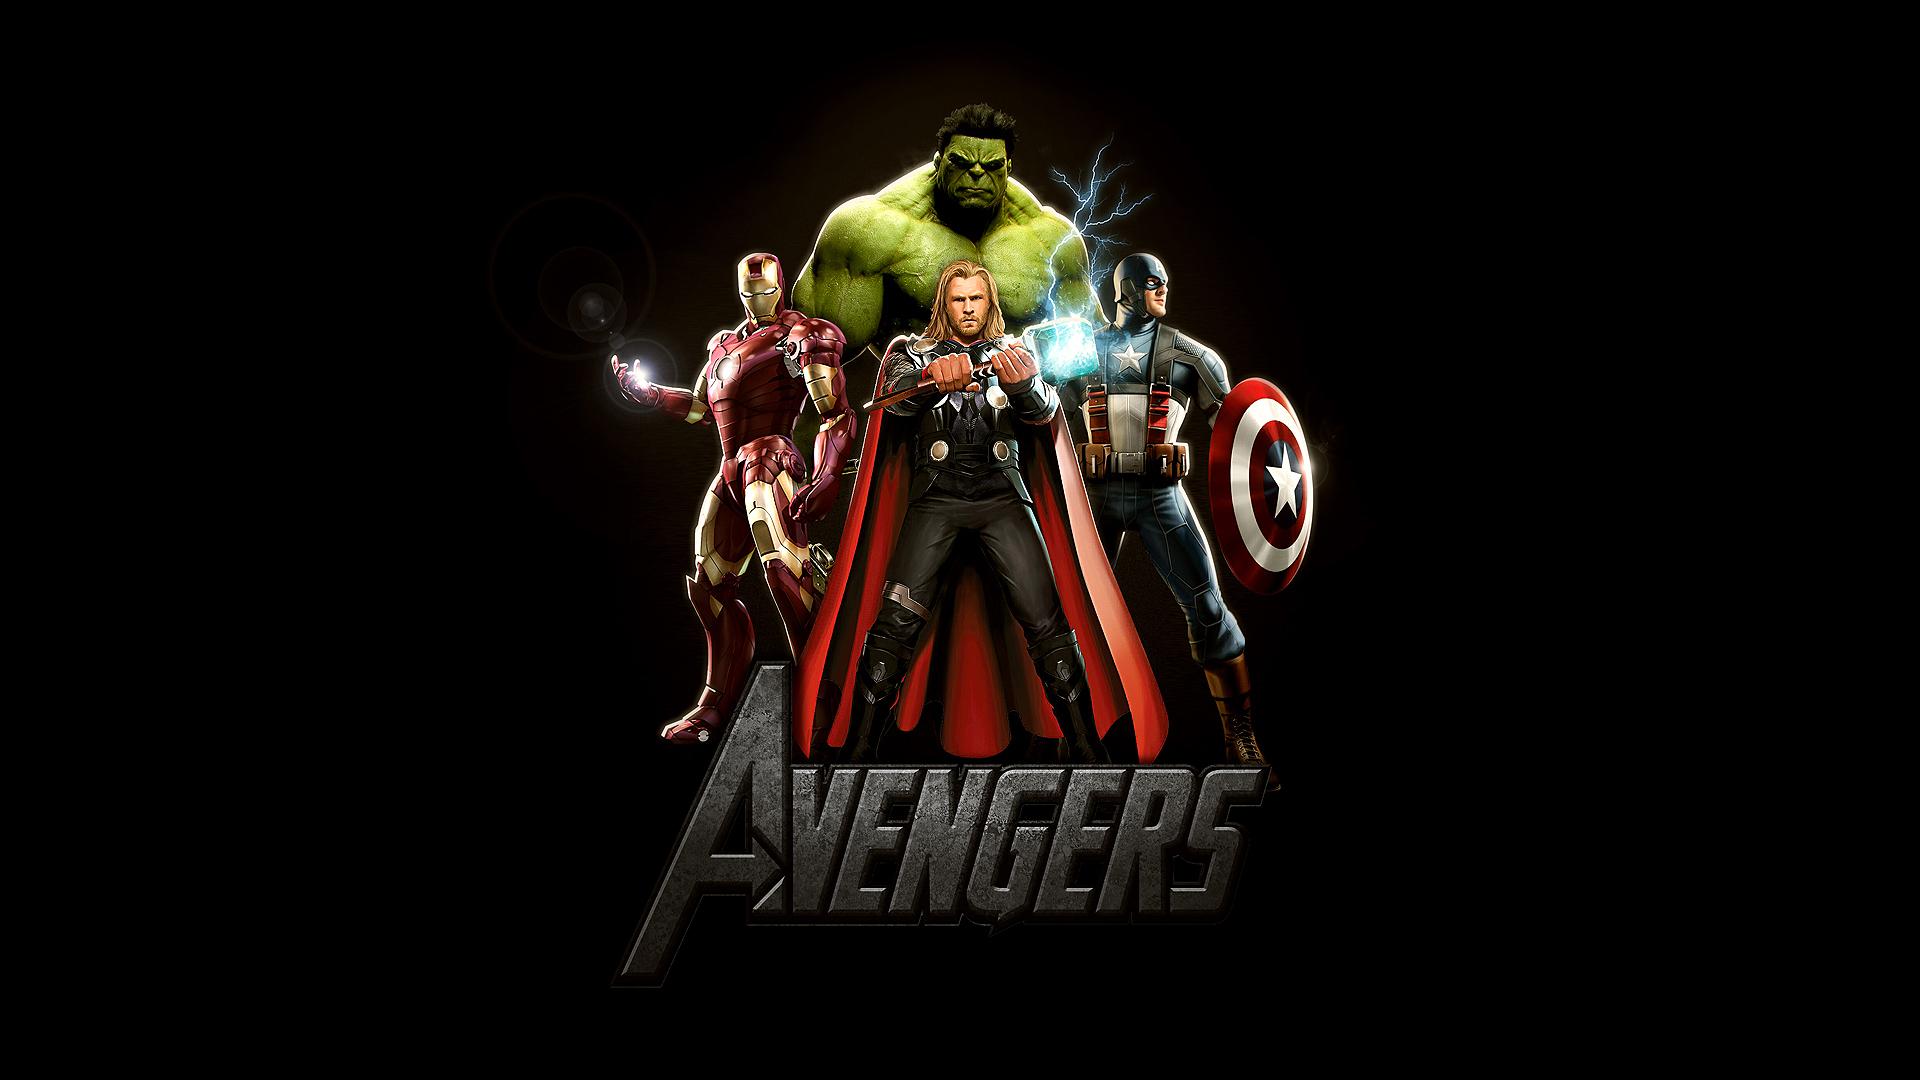 The Avengers The Avengers Assemble